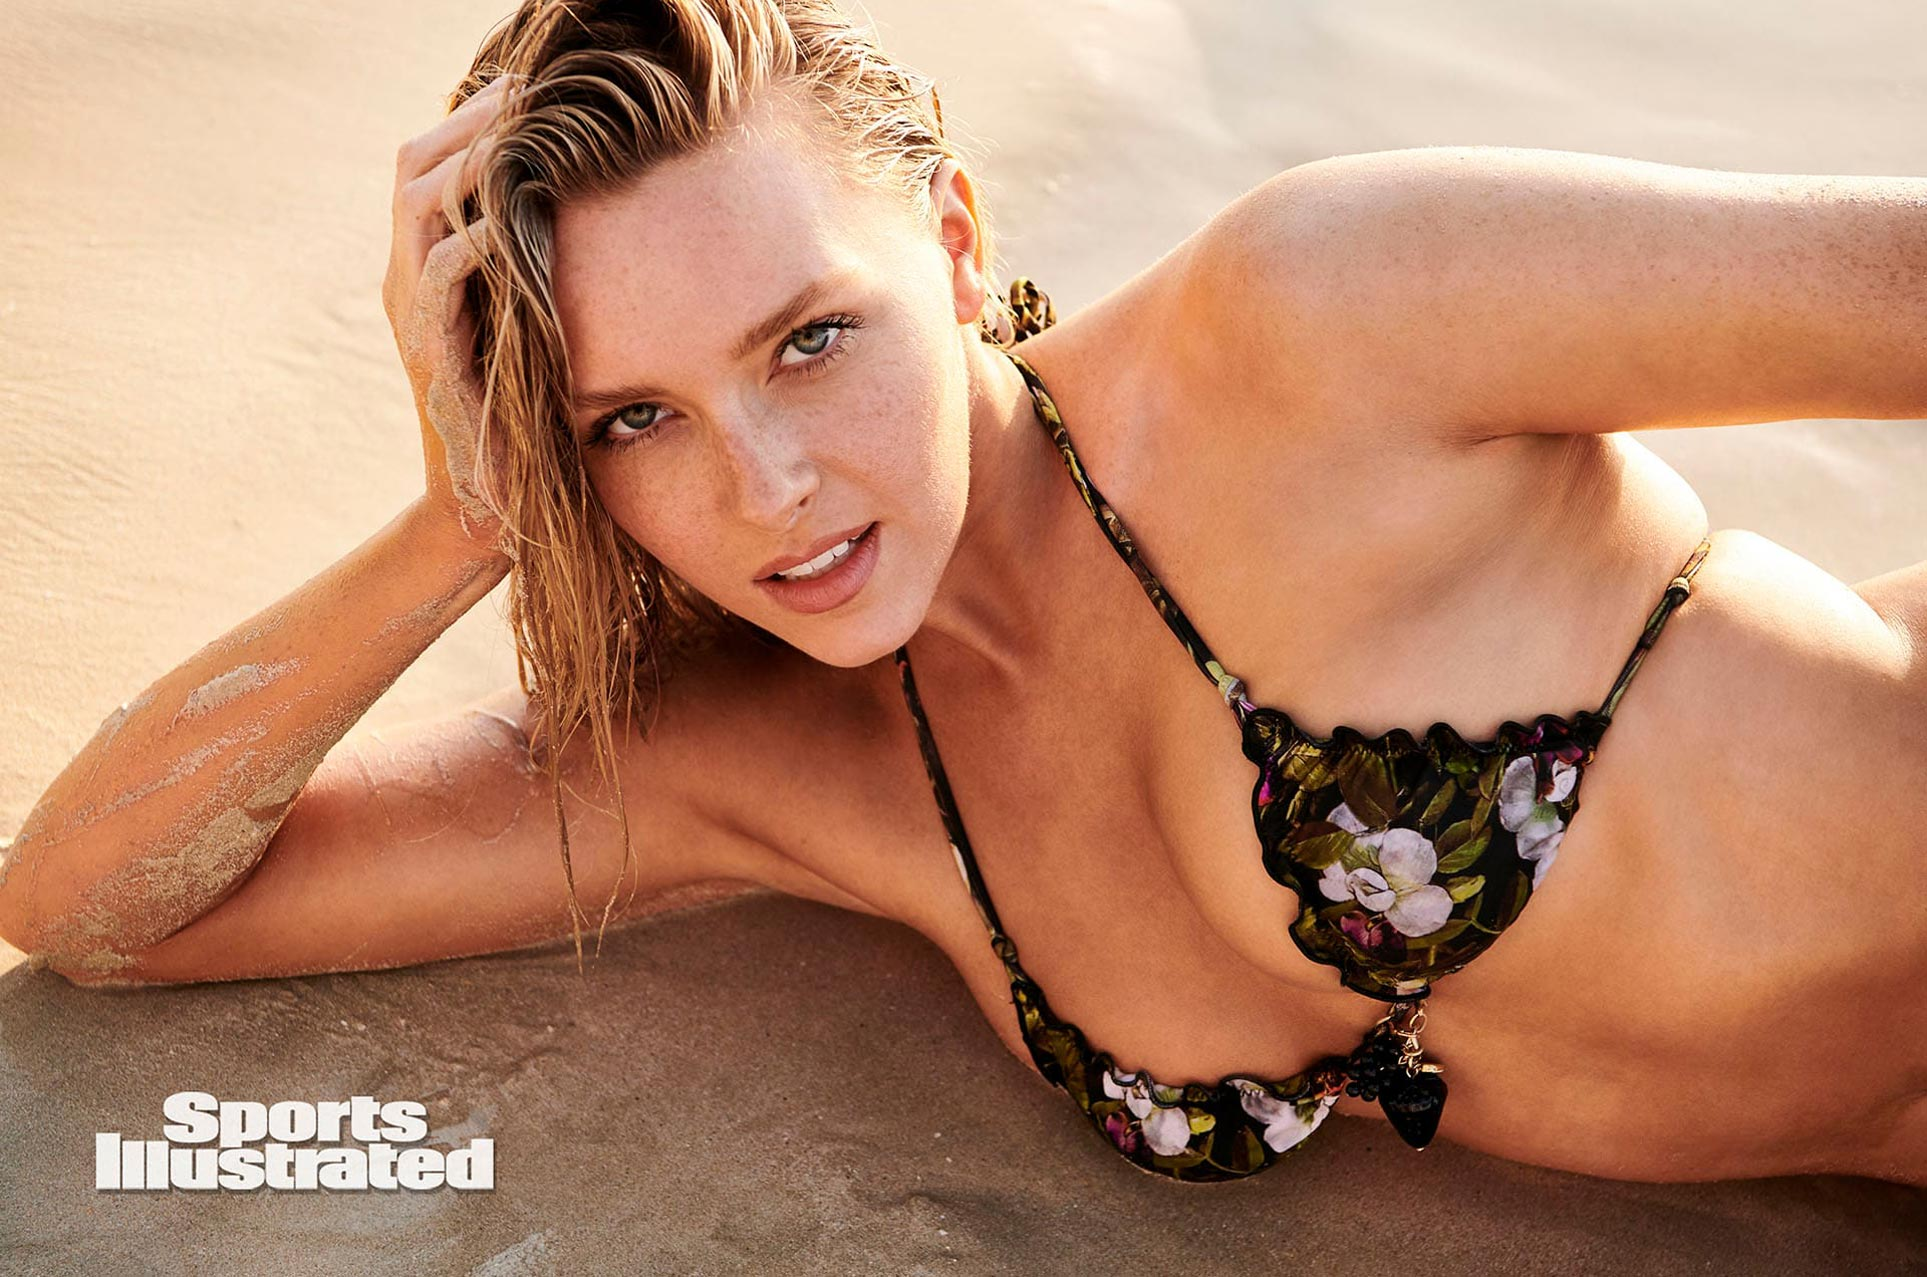 Камилла Костек в каталоге купальников Sports Illustrated Swimsuit 2020 / фото 17